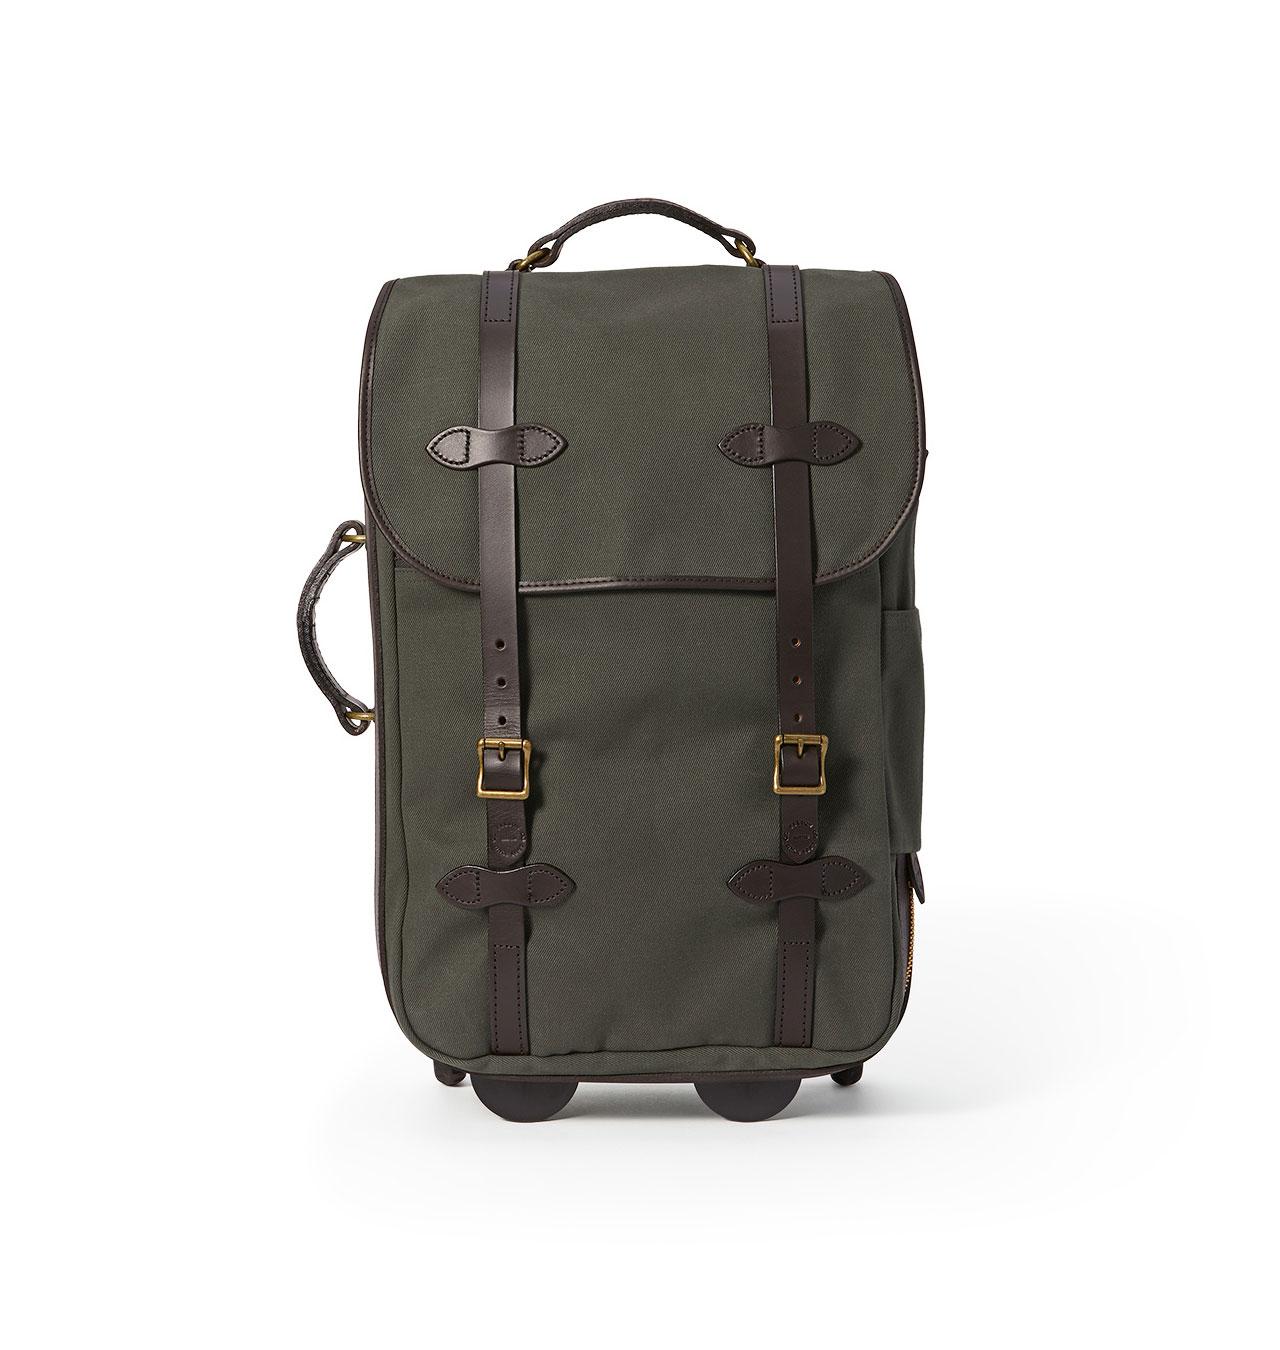 e697170c9ee Filson - Rugged Twill Rolling Carry-on Bag Medium - Otter Green